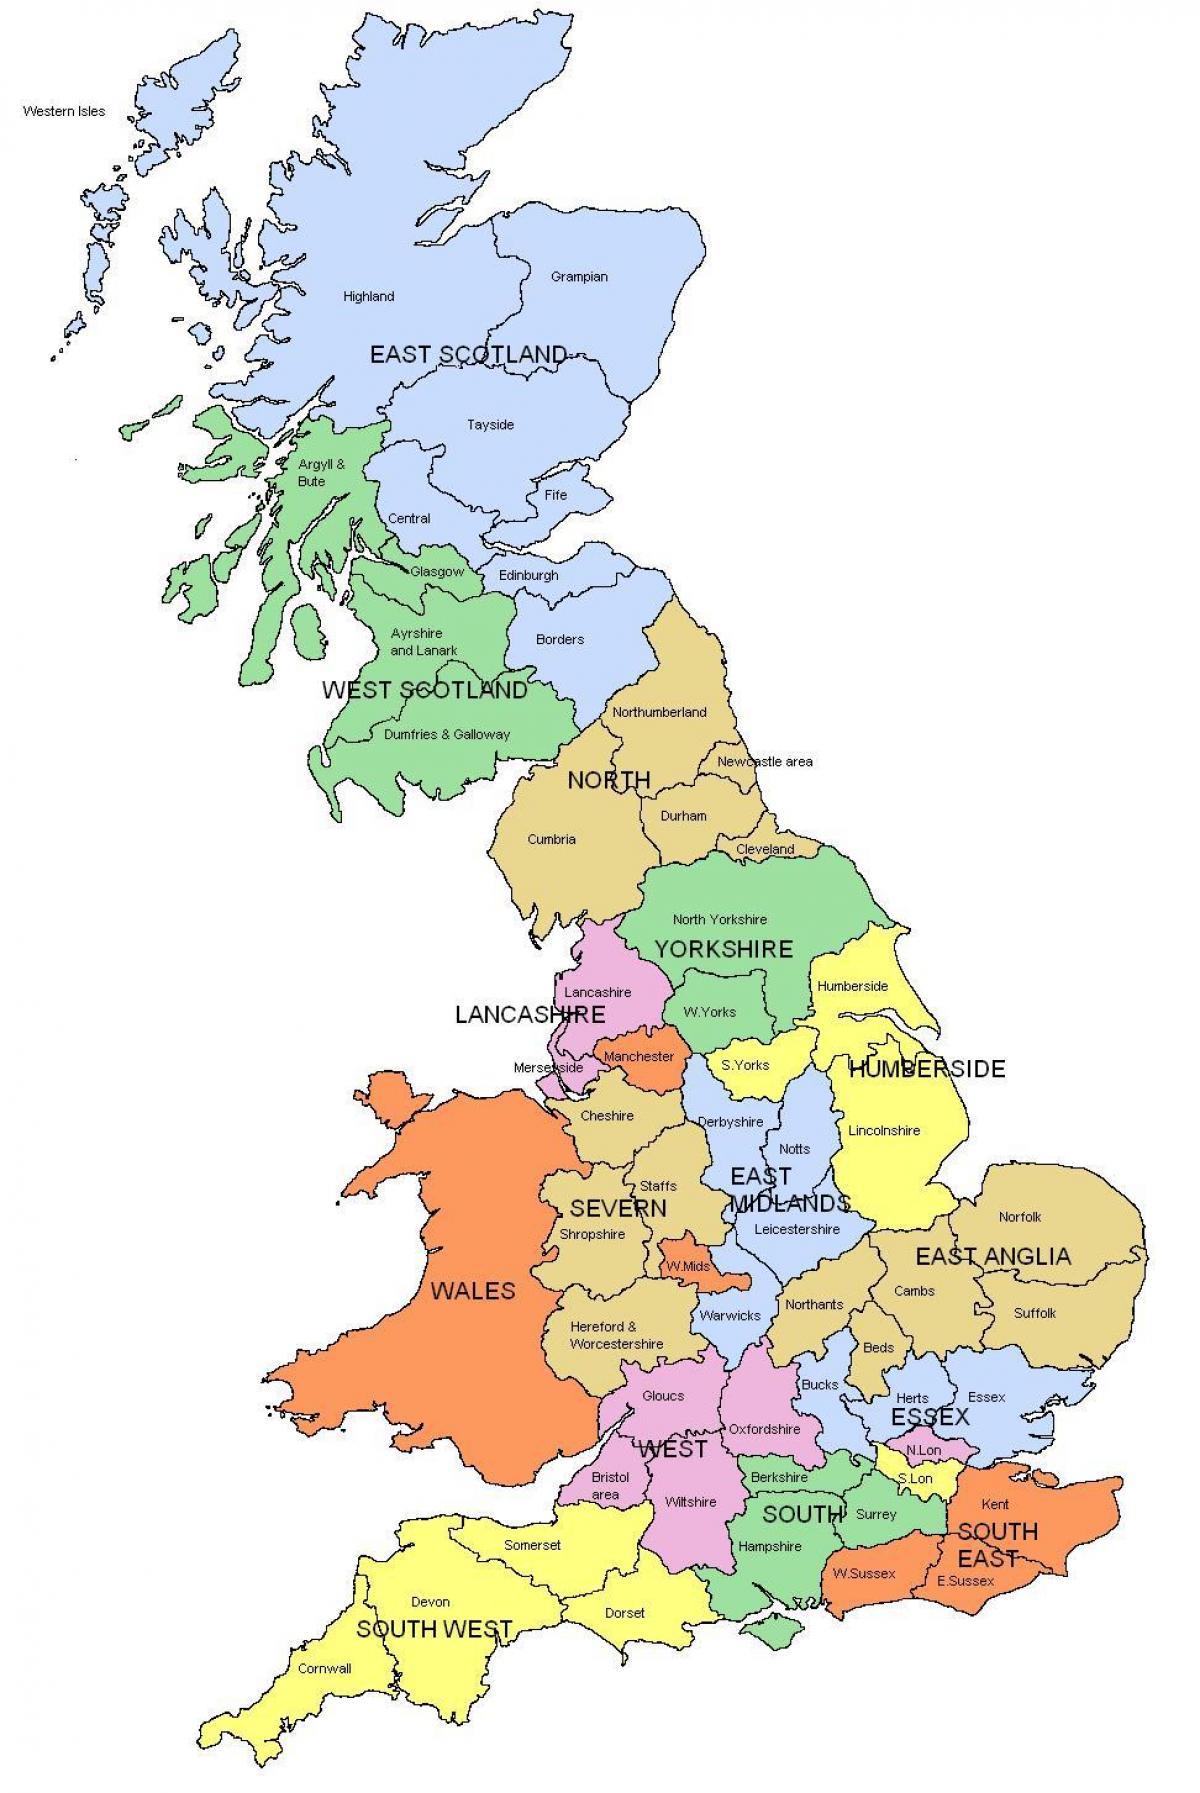 Suuri Kartta Uk Suuri Kartta Iso Britannia Pohjois Eurooppa